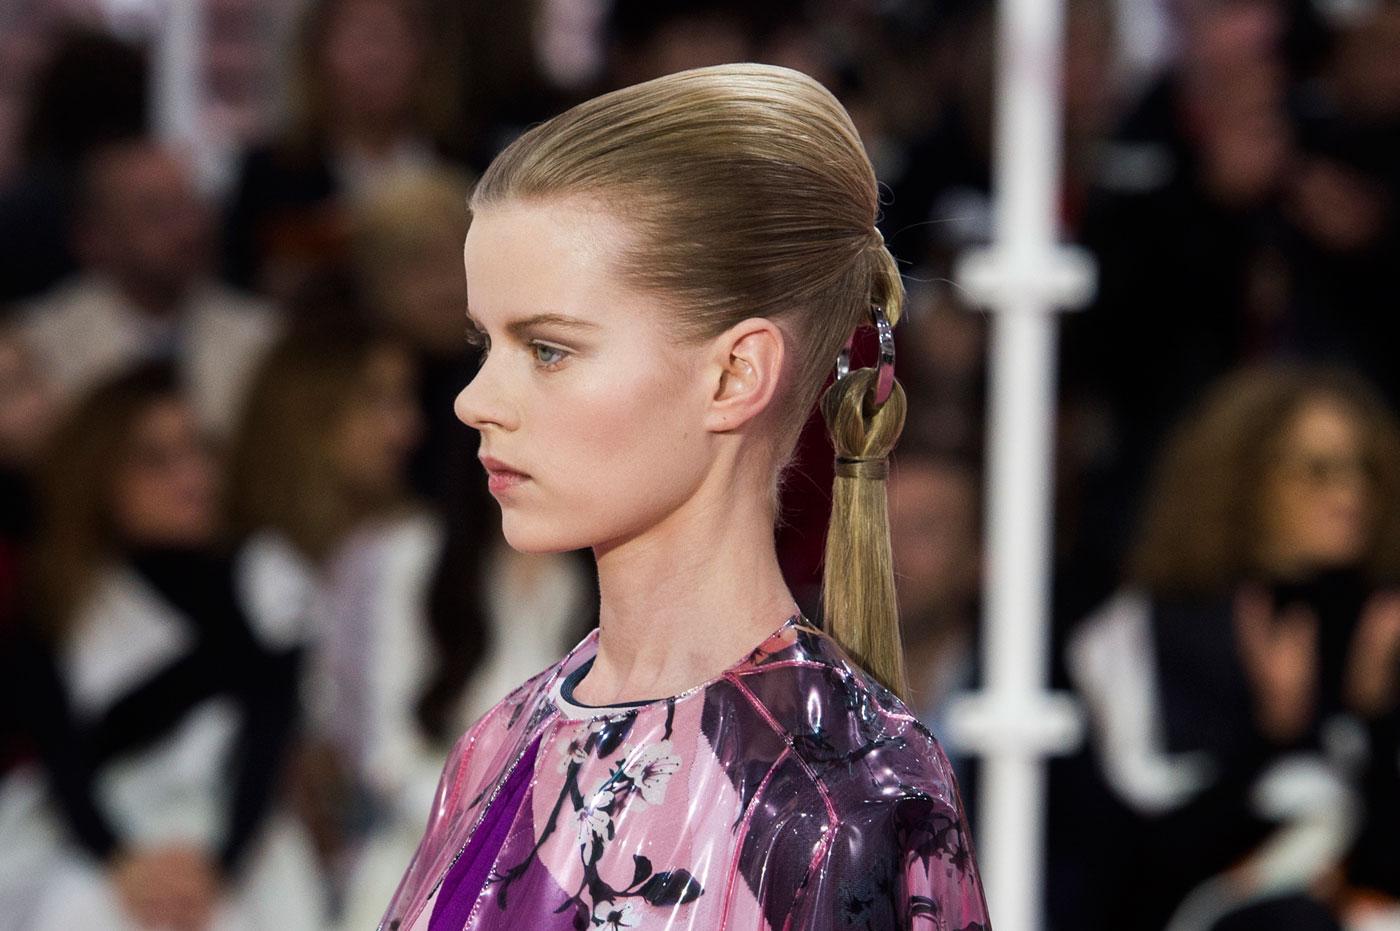 Christian-Dior-fashion-runway-show-close-ups-haute-couture-paris-spring-summer-2015-the-impression-203